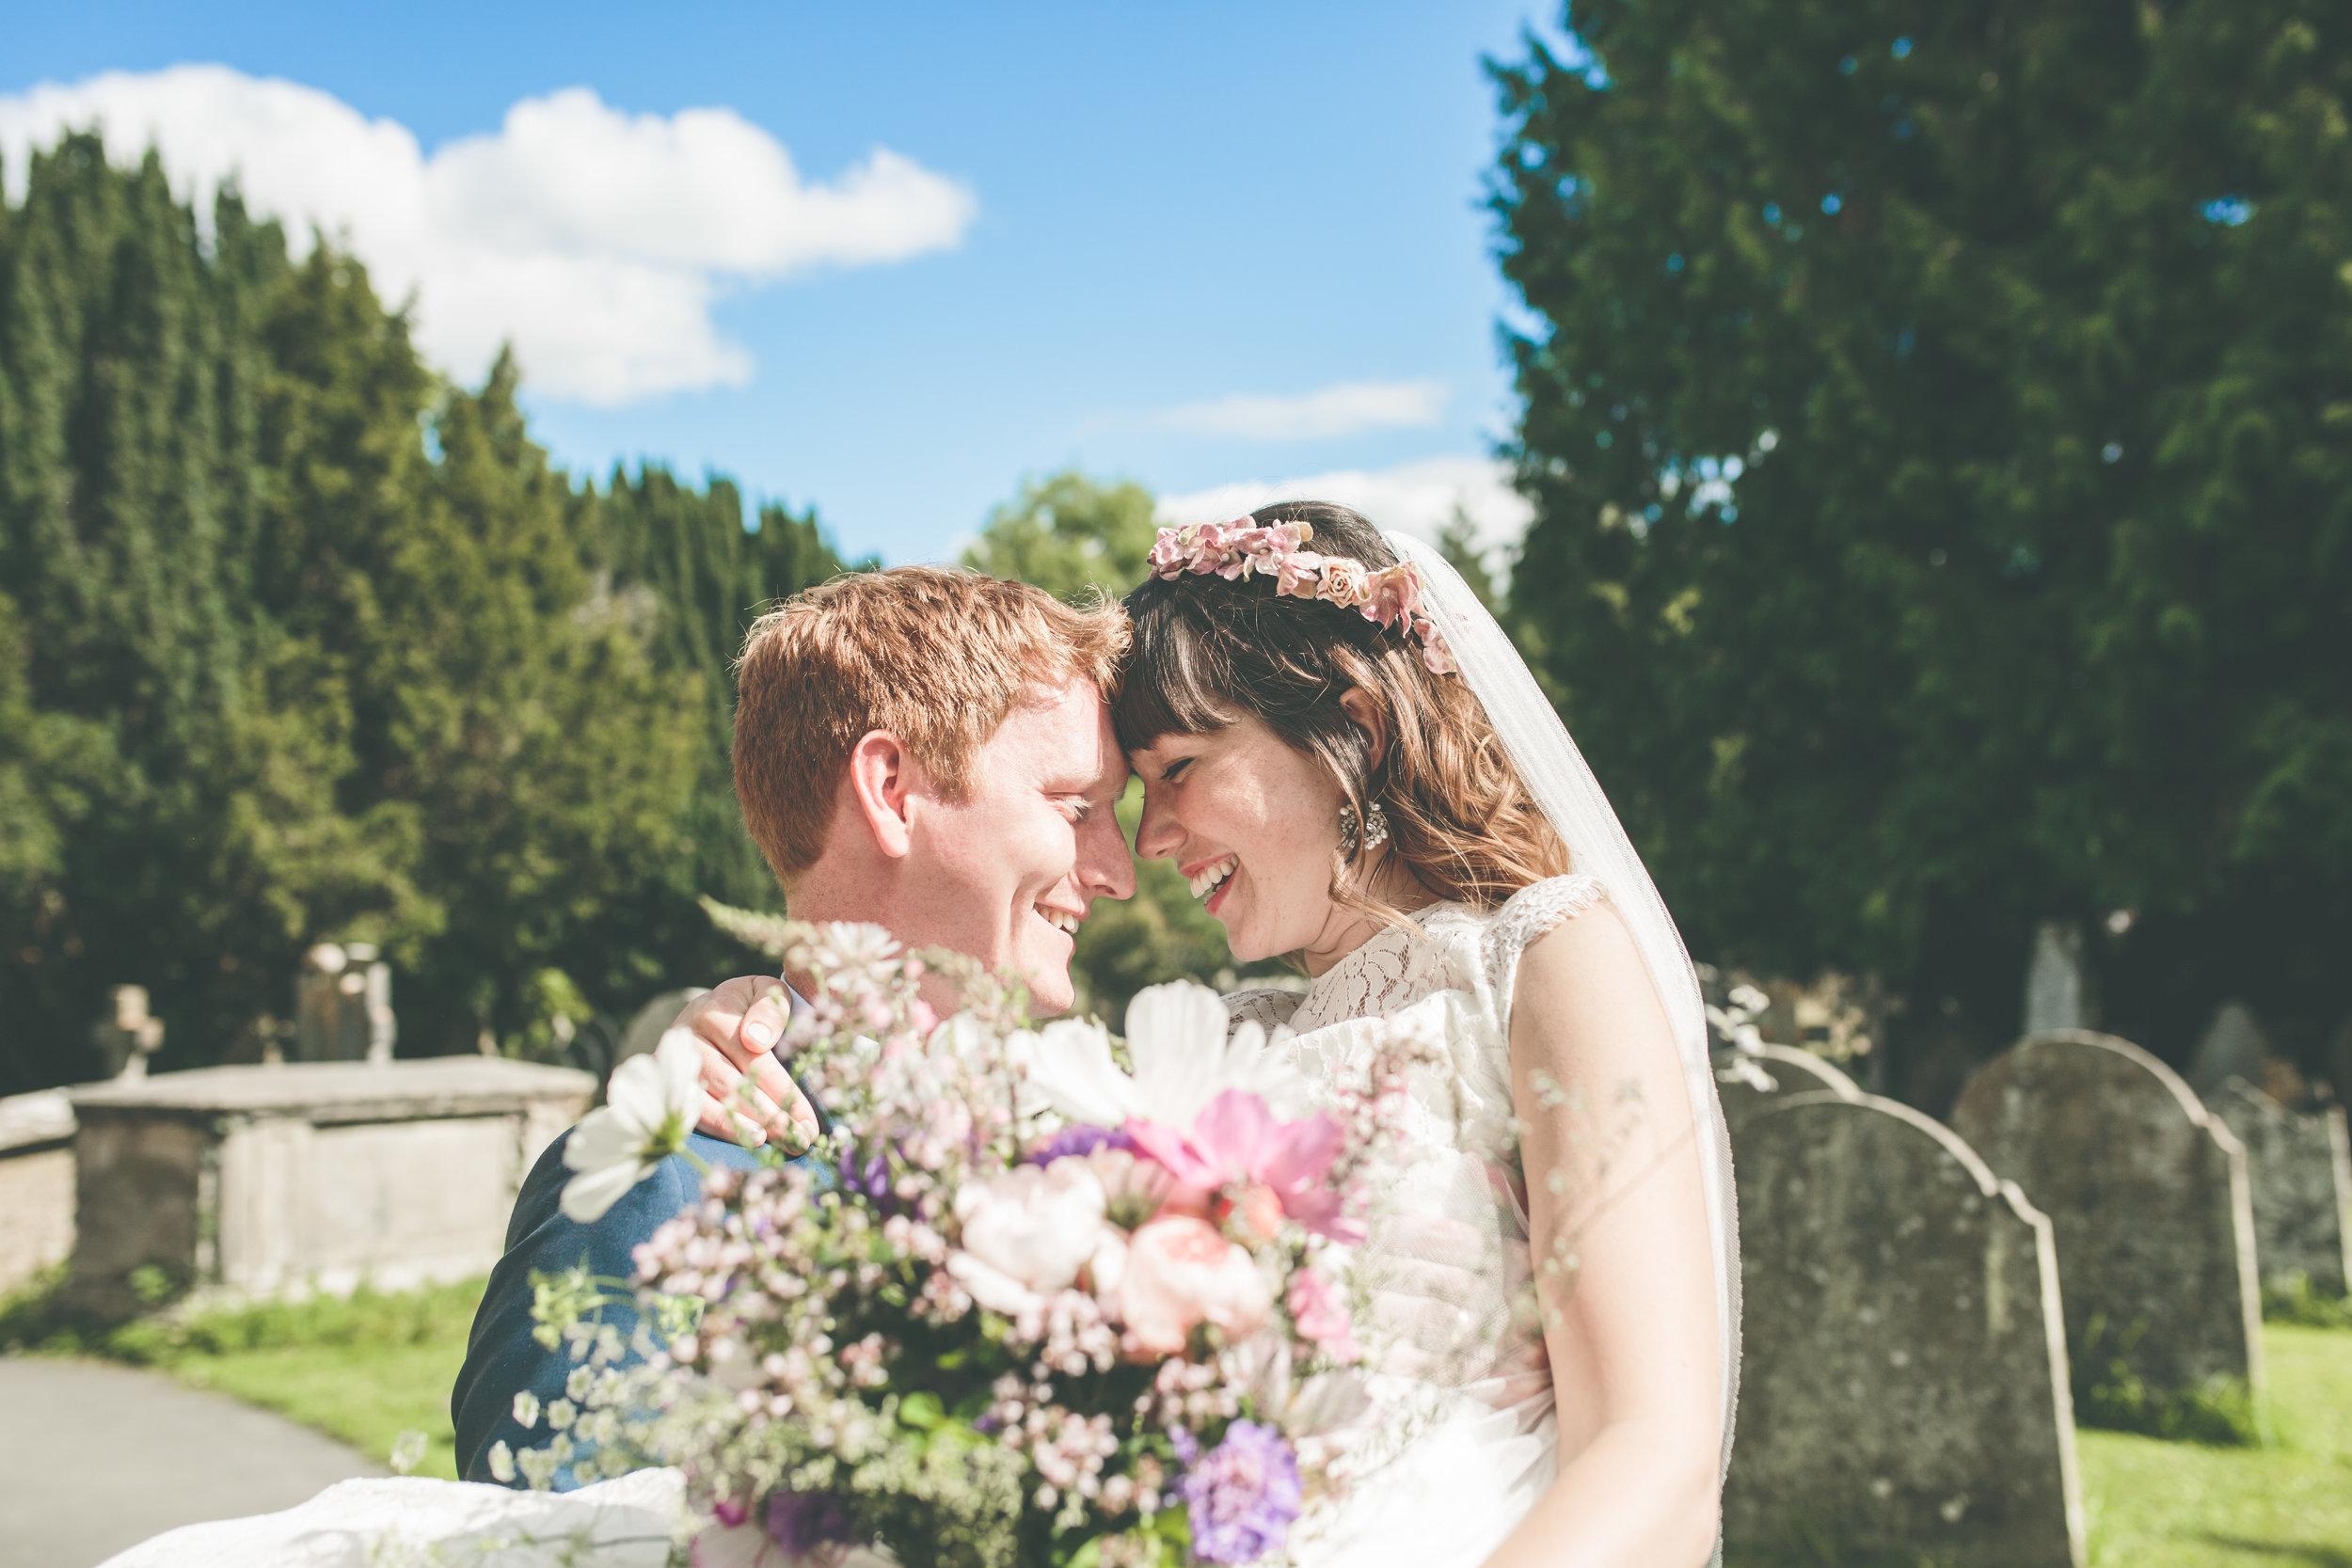 Walcot_Hall_Wedding_Photography_Jesse_Rose_-221.jpg